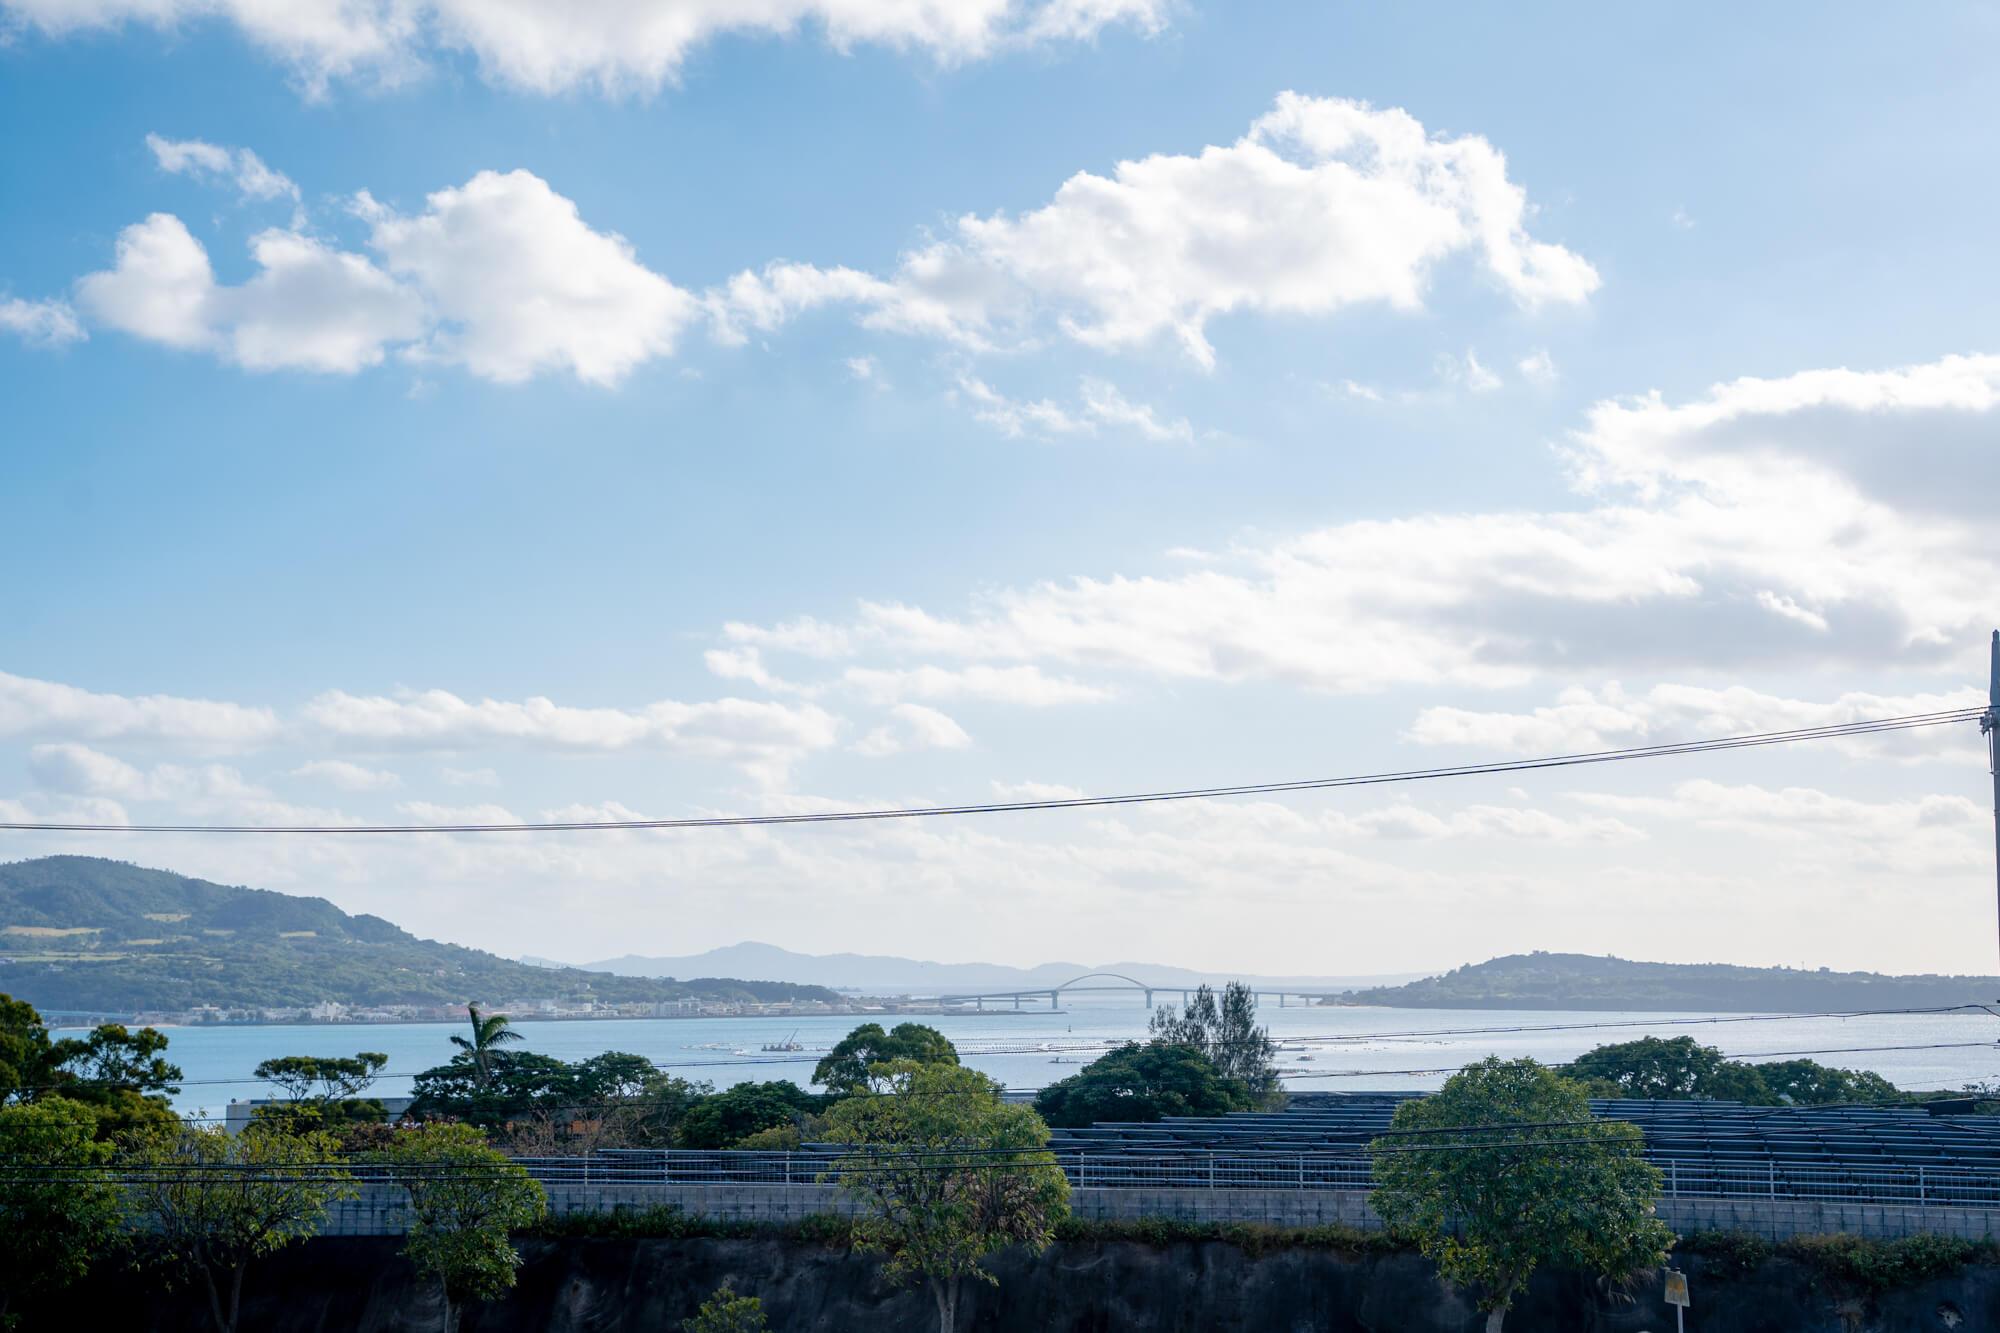 Hanasaki Marche沖繩北部美麗水族館 冰淇淋海景